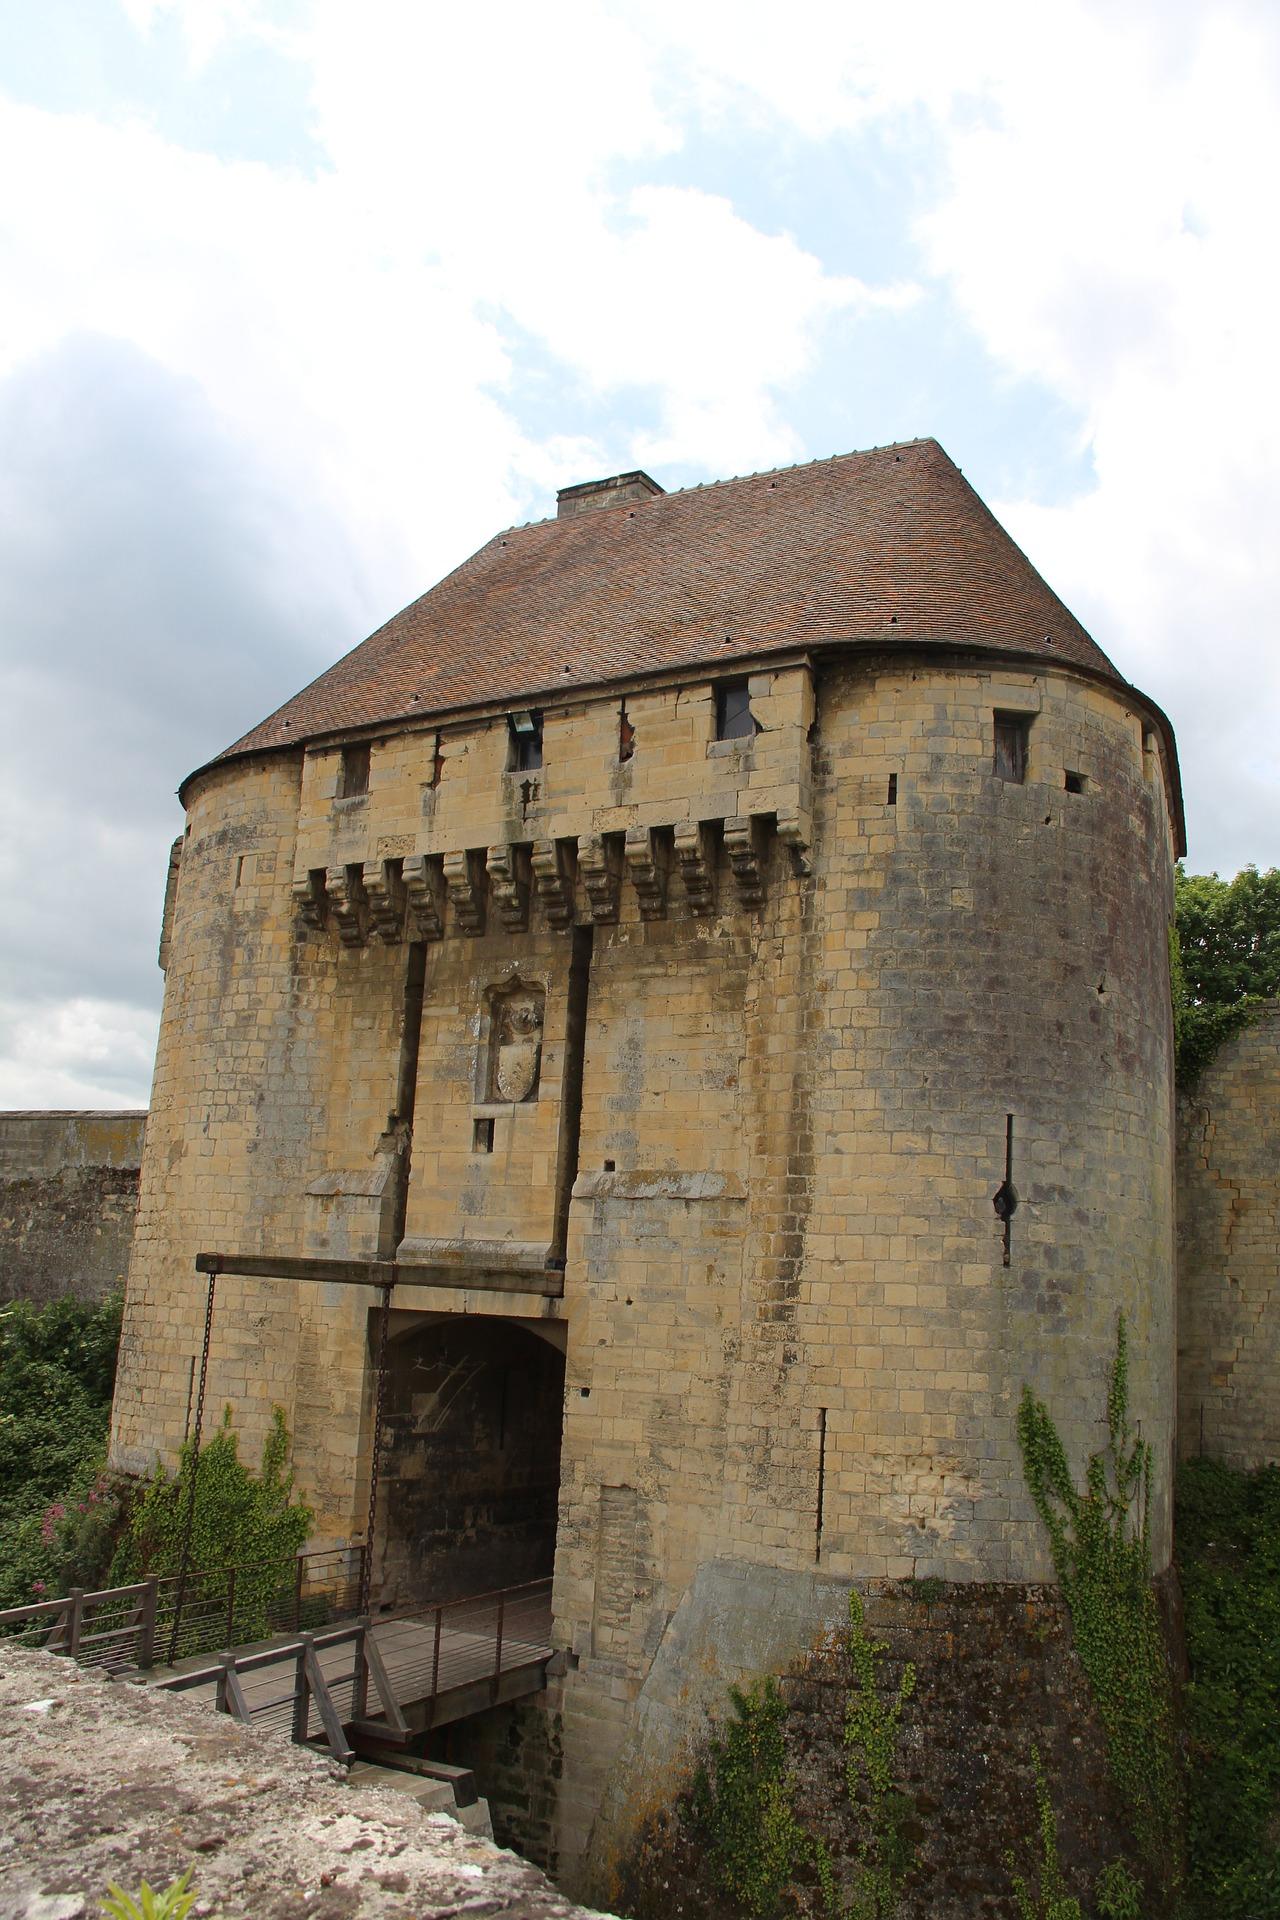 château médieval